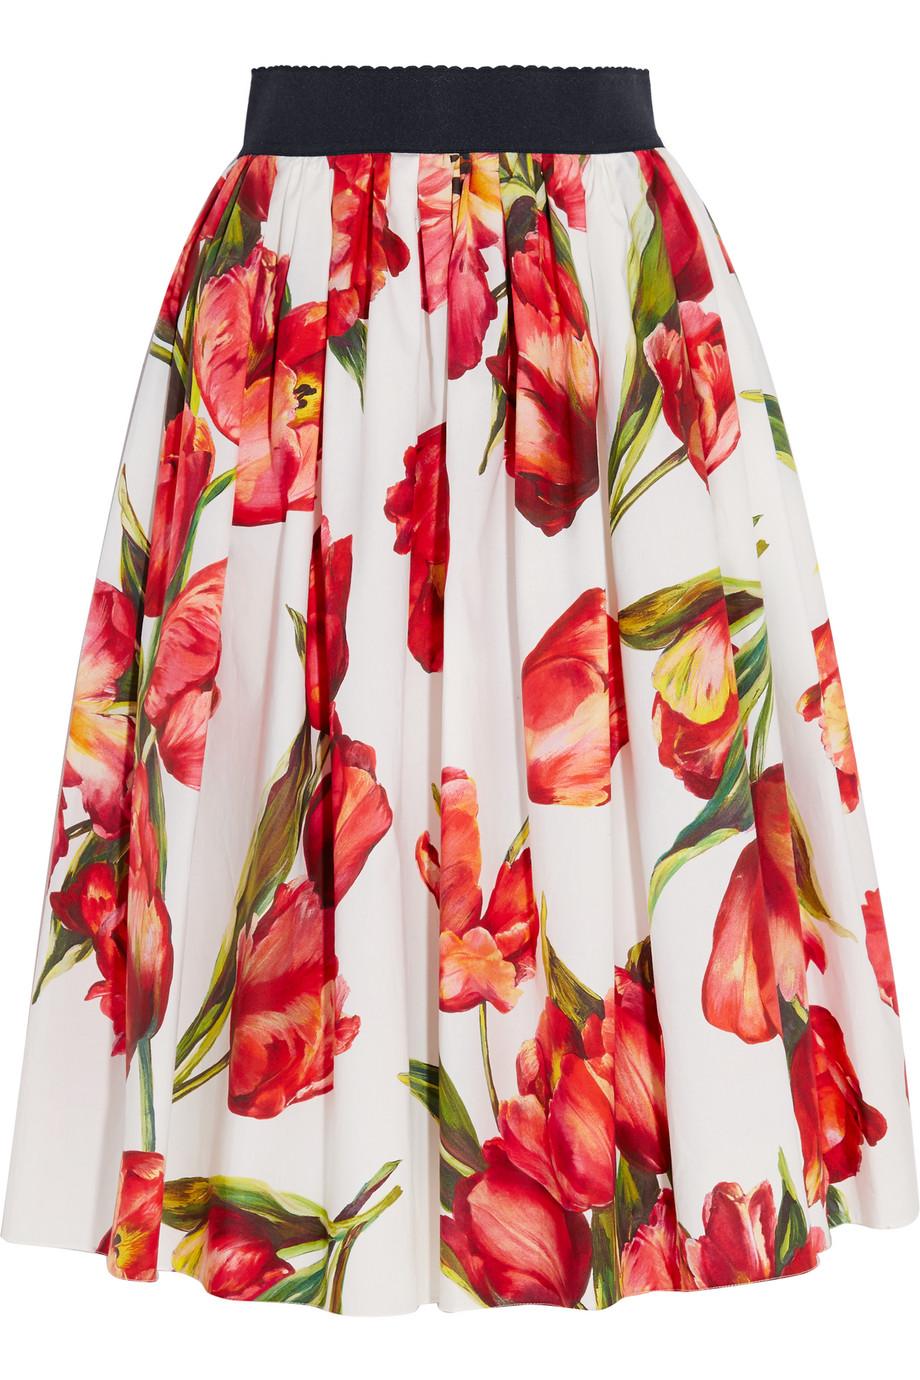 Dolce & Gabbana Floral-Print Cotton-Poplin Skirt, Red, Women's, Size: 46